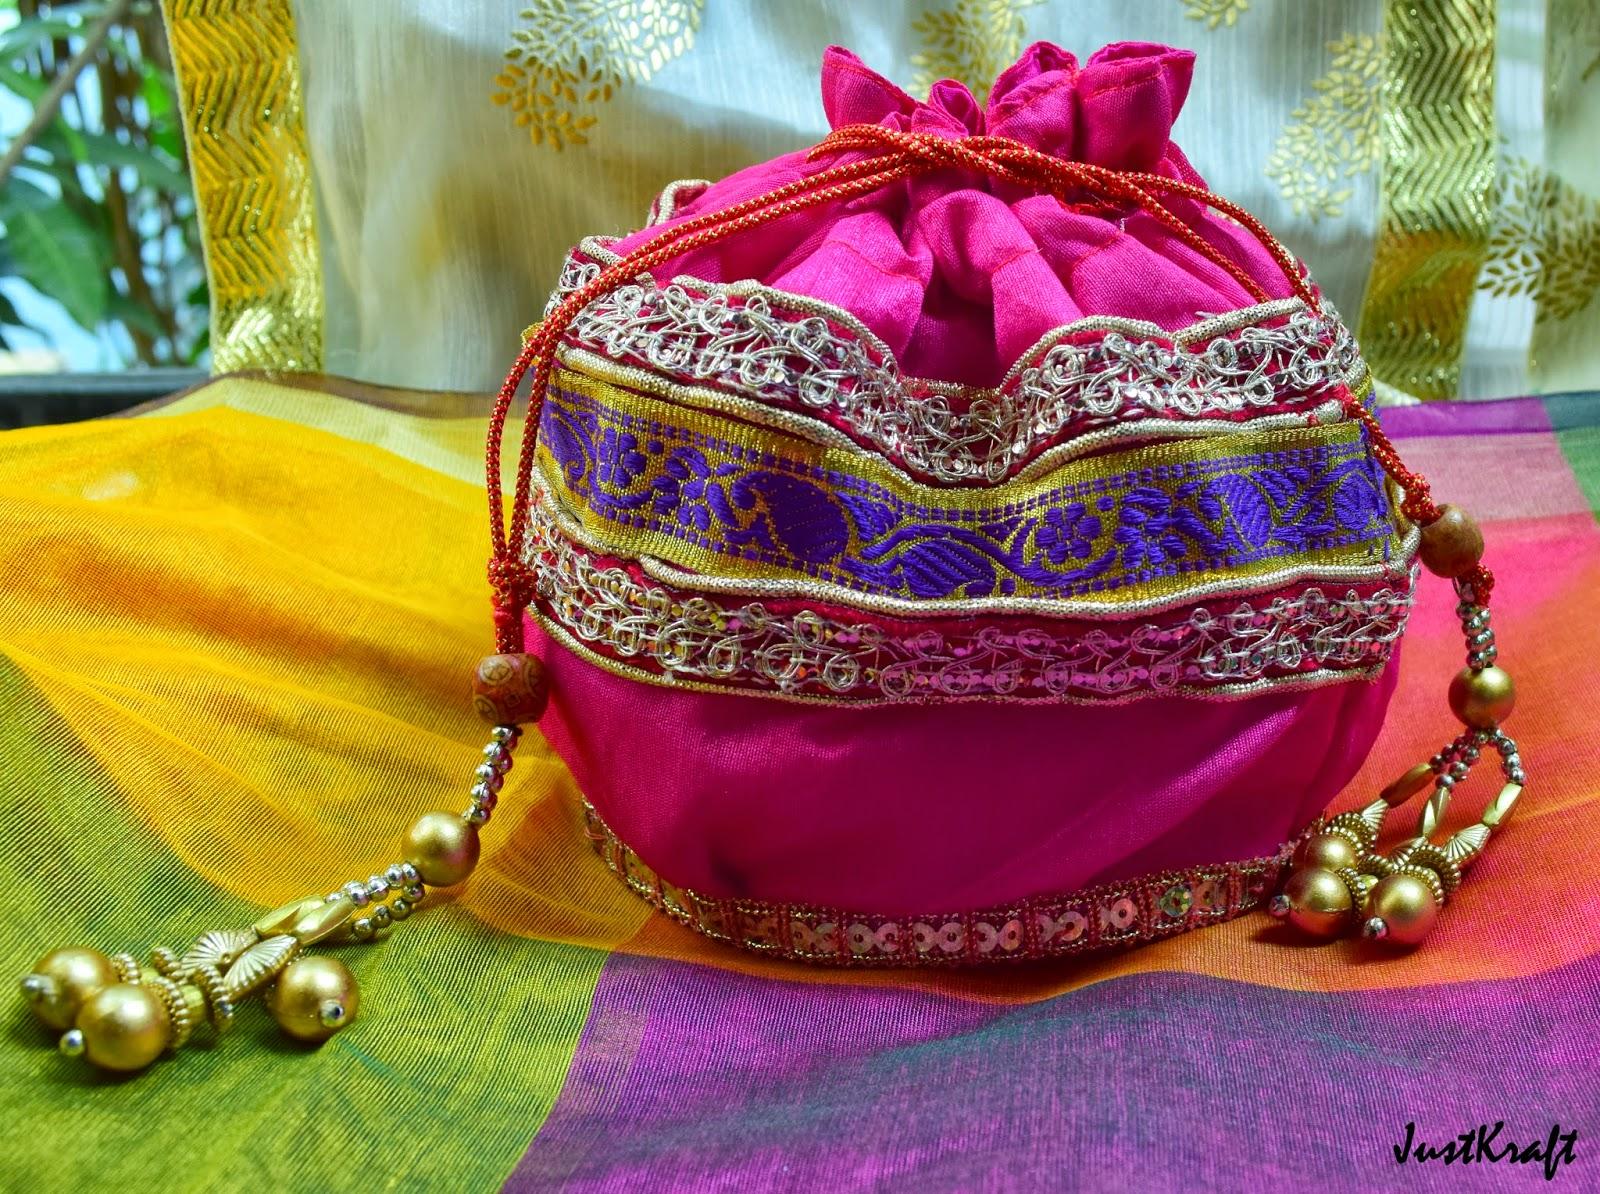 Pink Raw Silk Polti or Drawstring bags